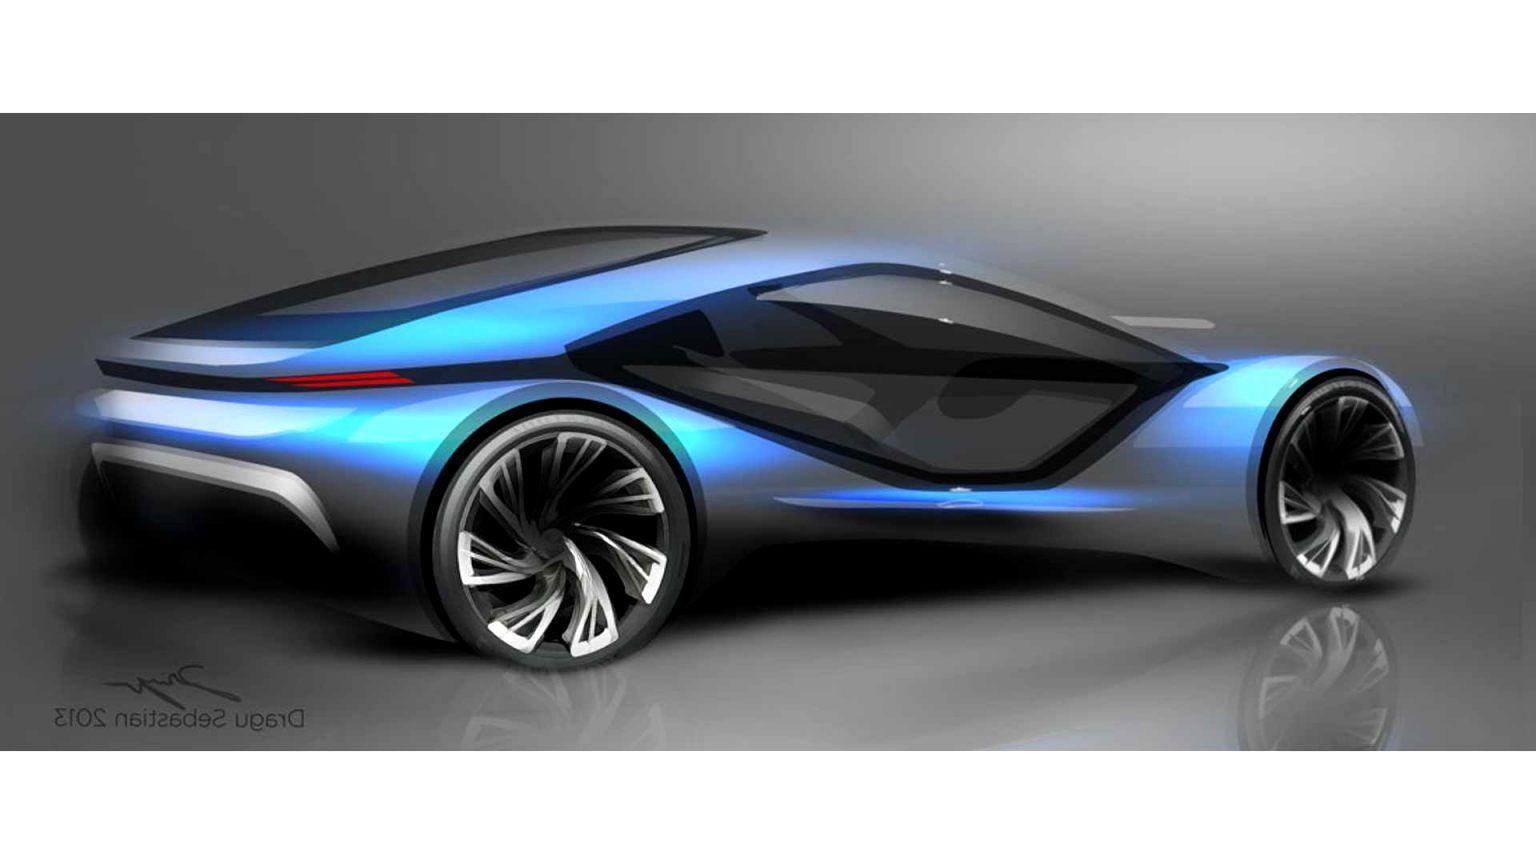 Bmw I9 2020 Configurations In 2020 Bmw Bmw I Bmw Cars